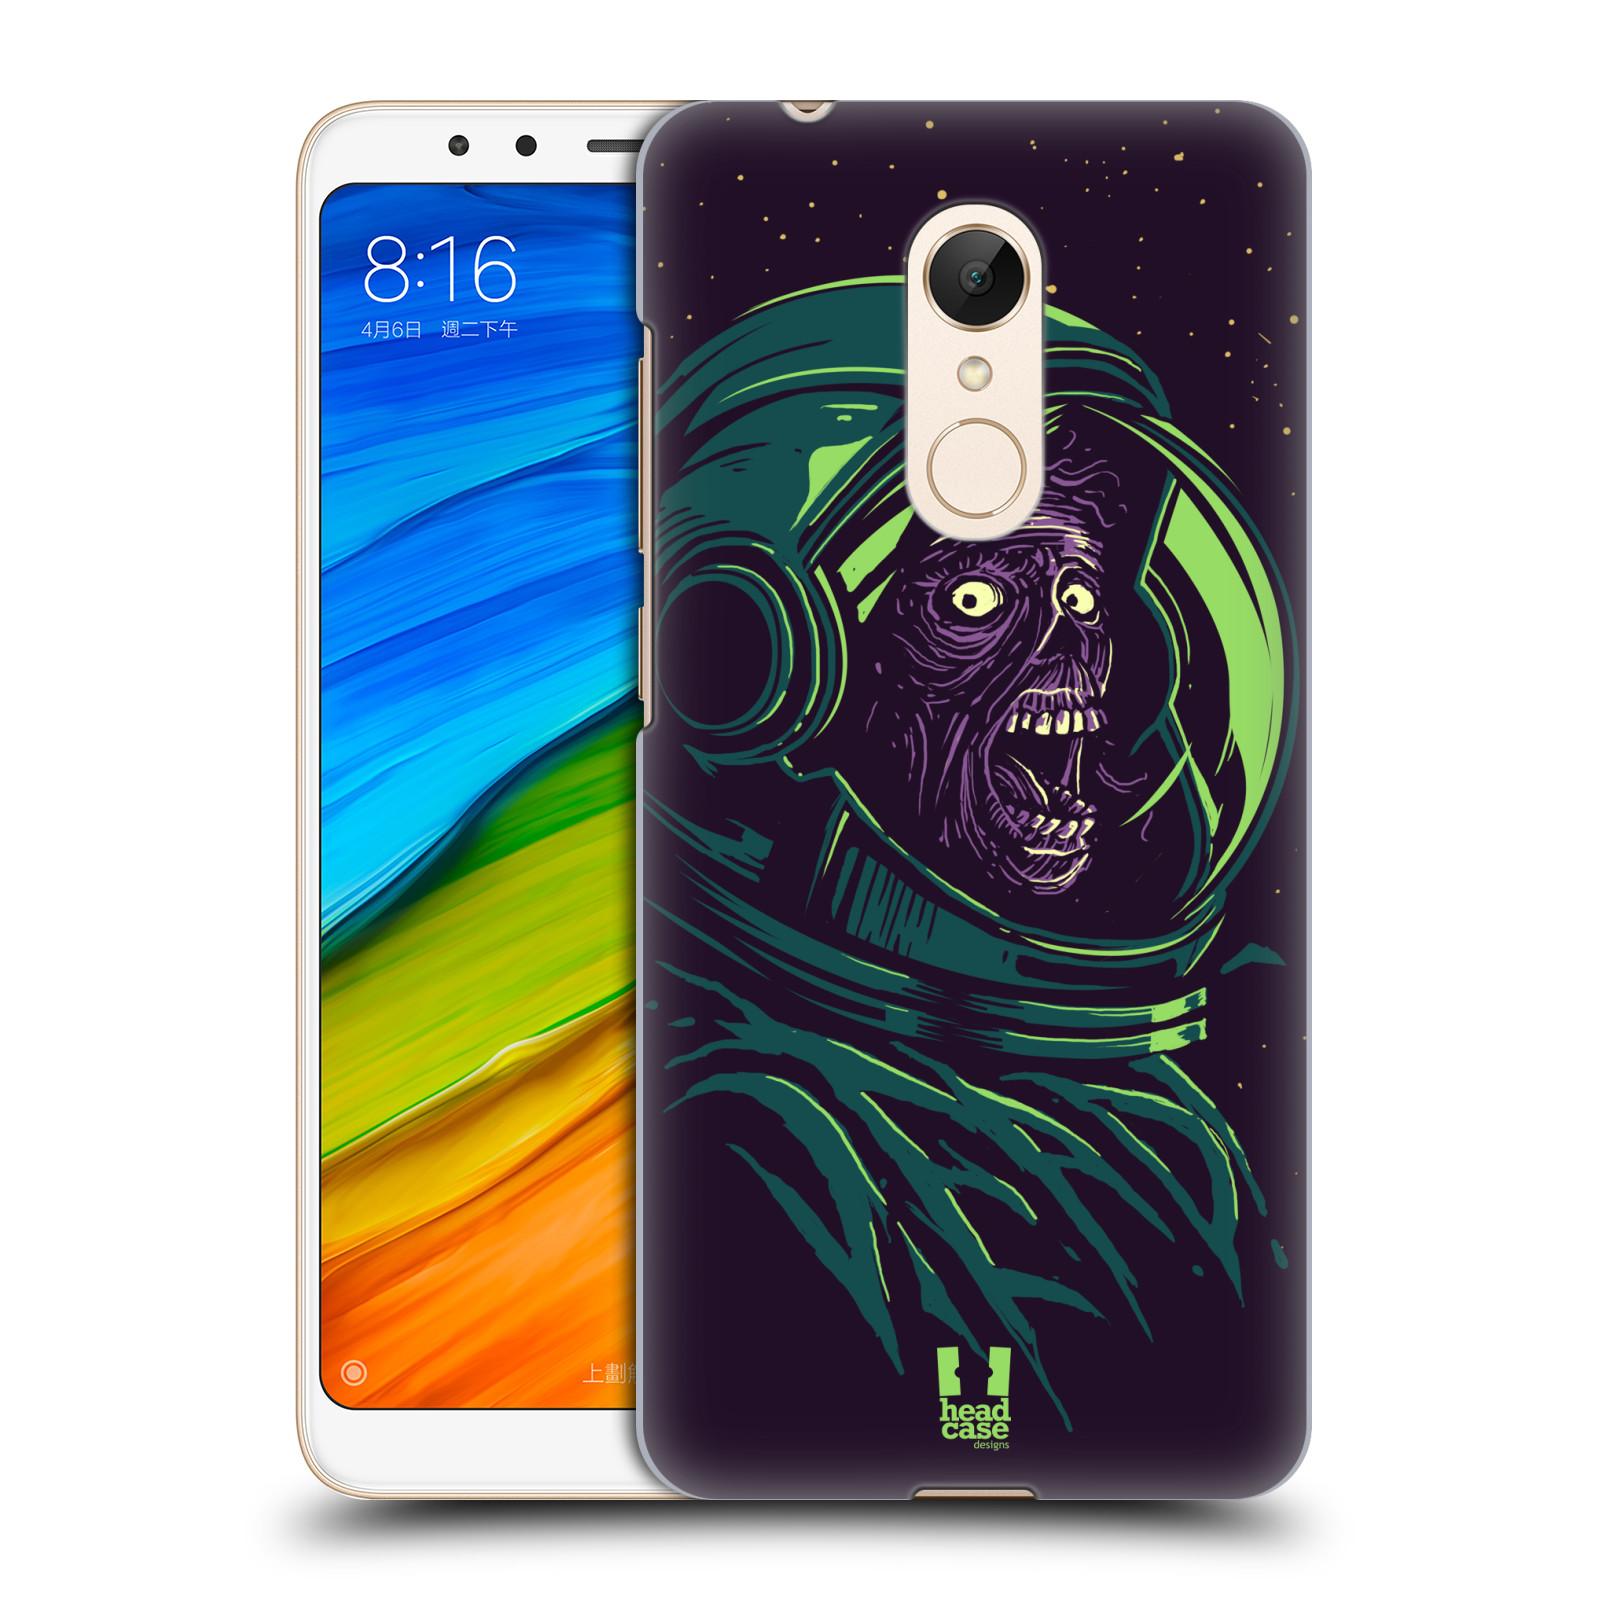 Plastové pouzdro na mobil Xiaomi Redmi 5 - Head Case - ZOMBIE VESMÍR ... 6c2c32946d6